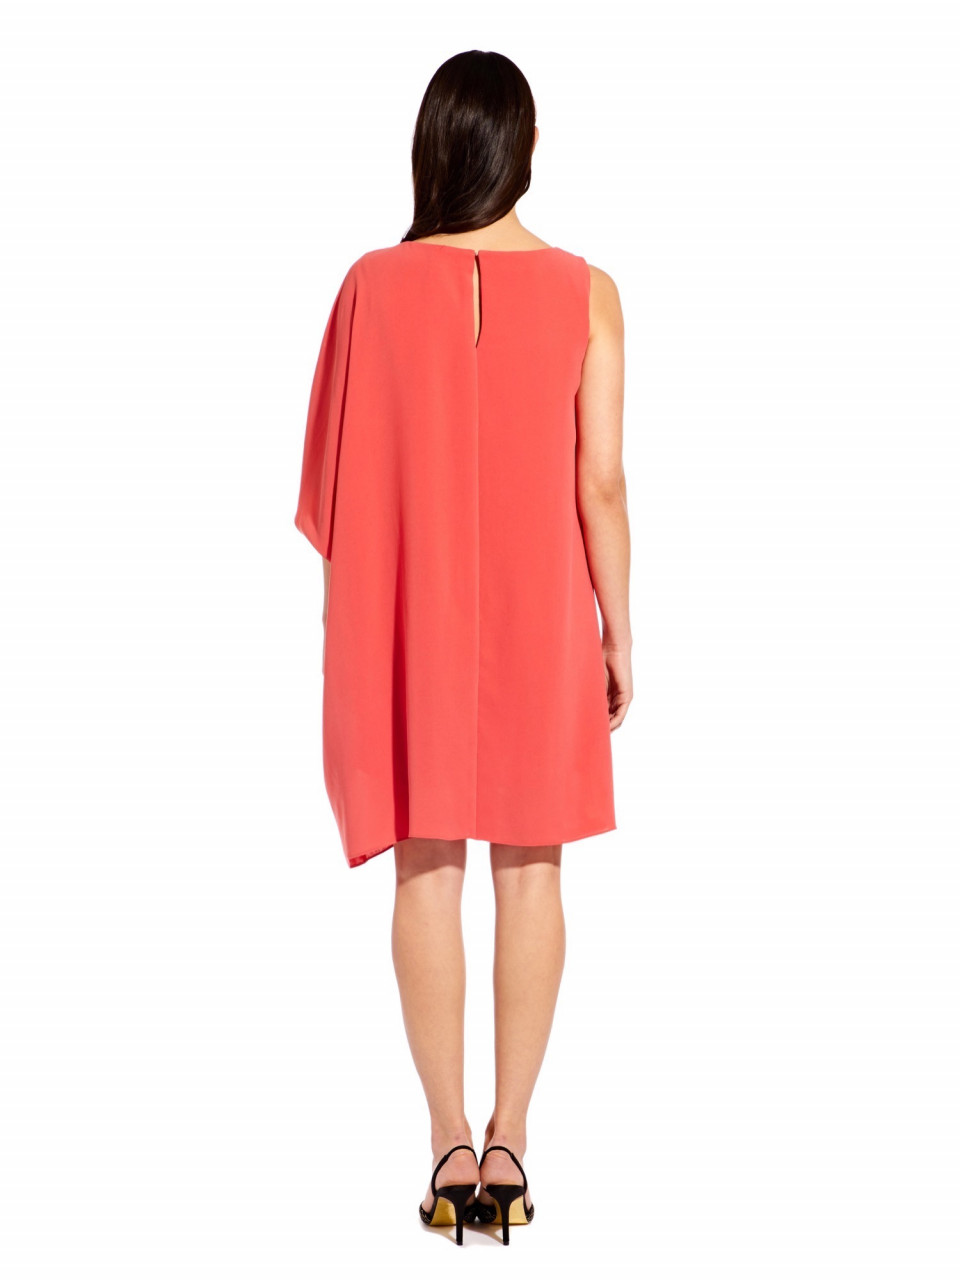 Gauzy crepe caftan dress